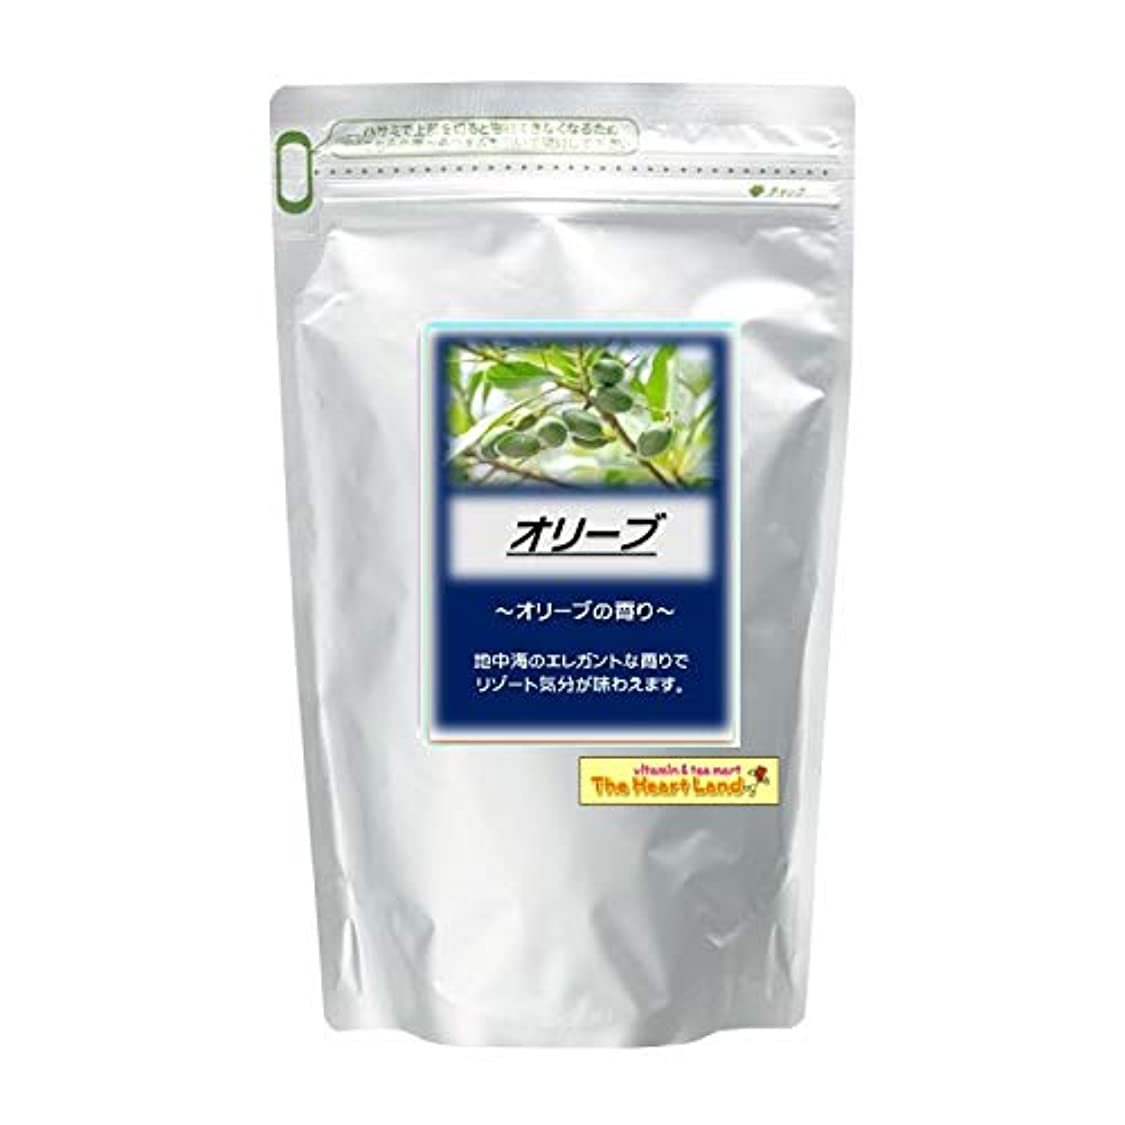 信仰群衆乳白色アサヒ入浴剤 浴用入浴化粧品 オリーブ 300g